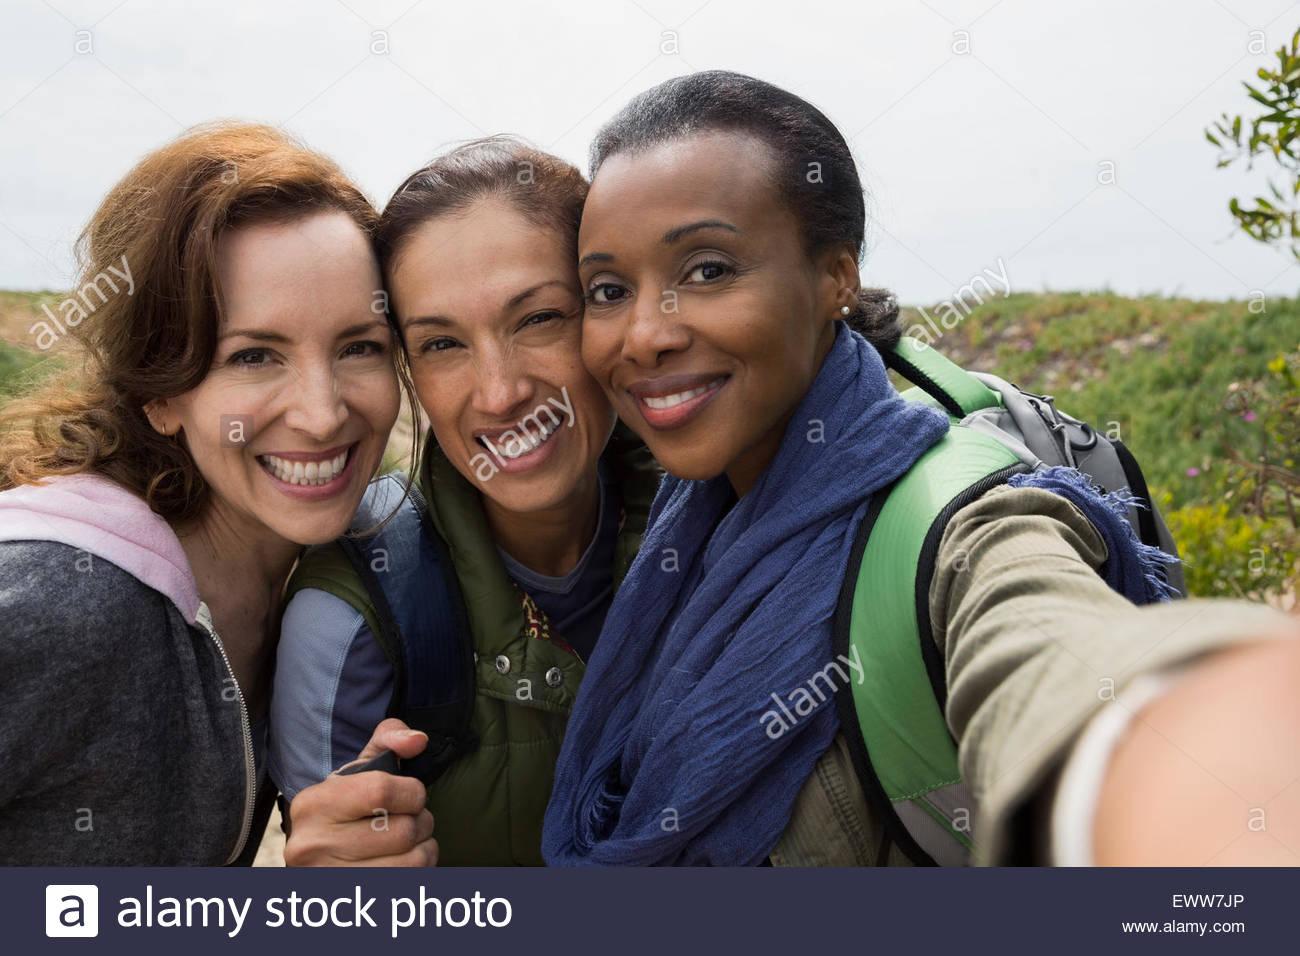 Portrait smiling women hikers - Stock Image